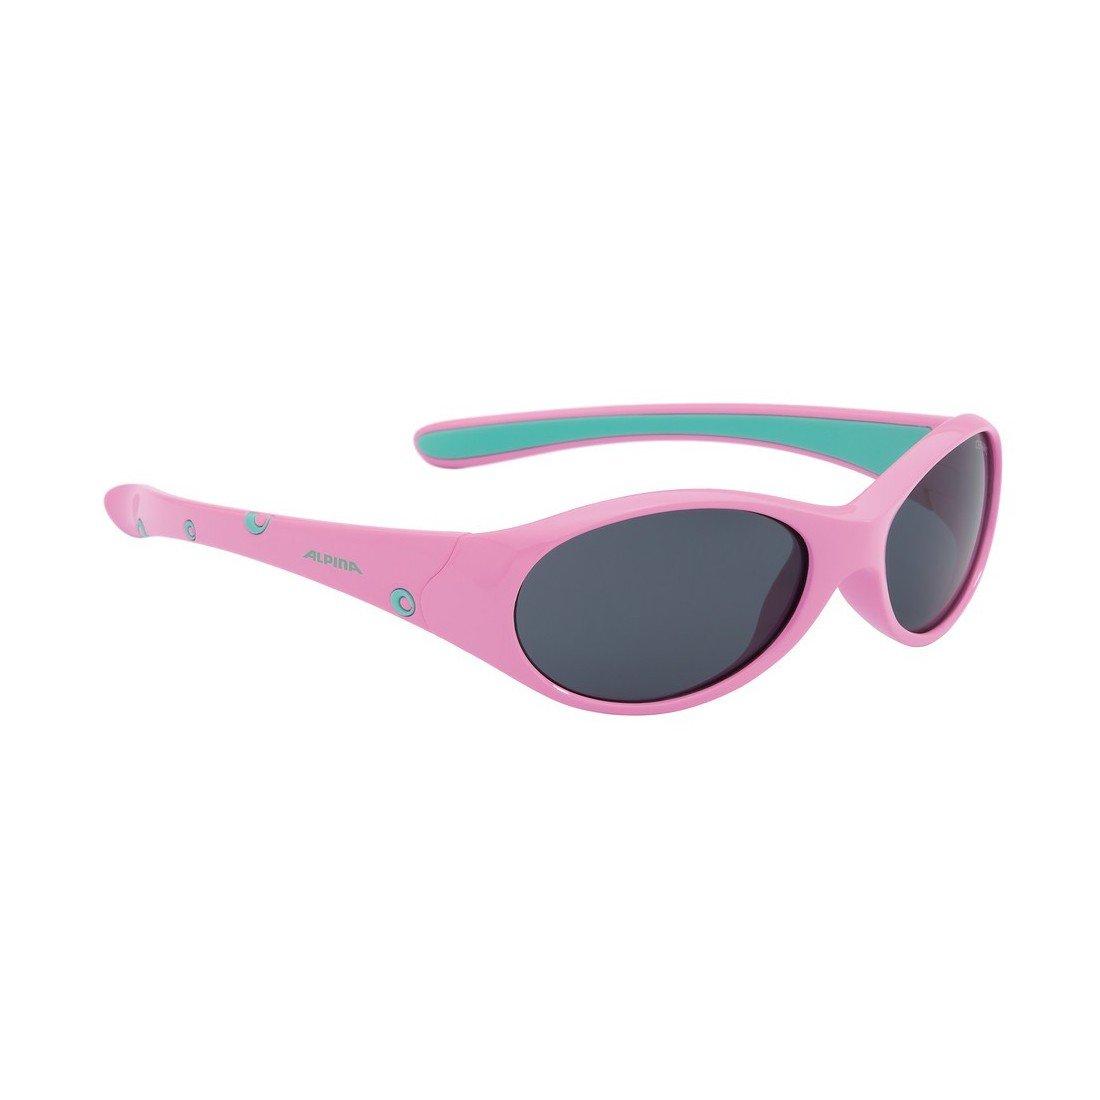 Alpina Flexxy Girl's Sunglasses Pink Fassung: Pink-Rose; Gläser: Black S3 Size:- ALPJK|#ALPINA A8494351370